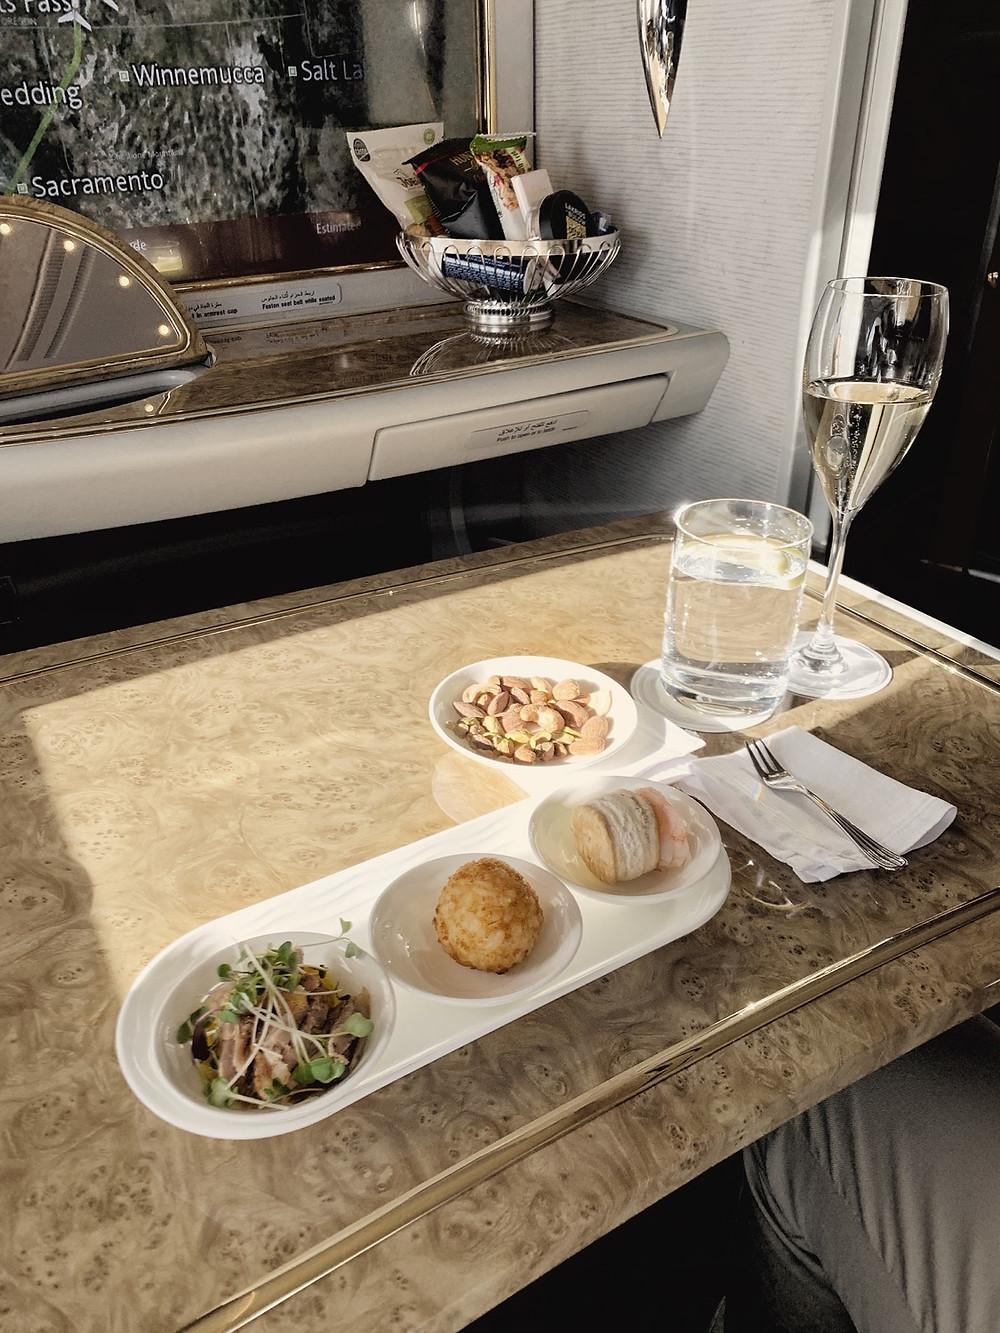 Emirates First Class San Francisco - Dubai, Canapes Service